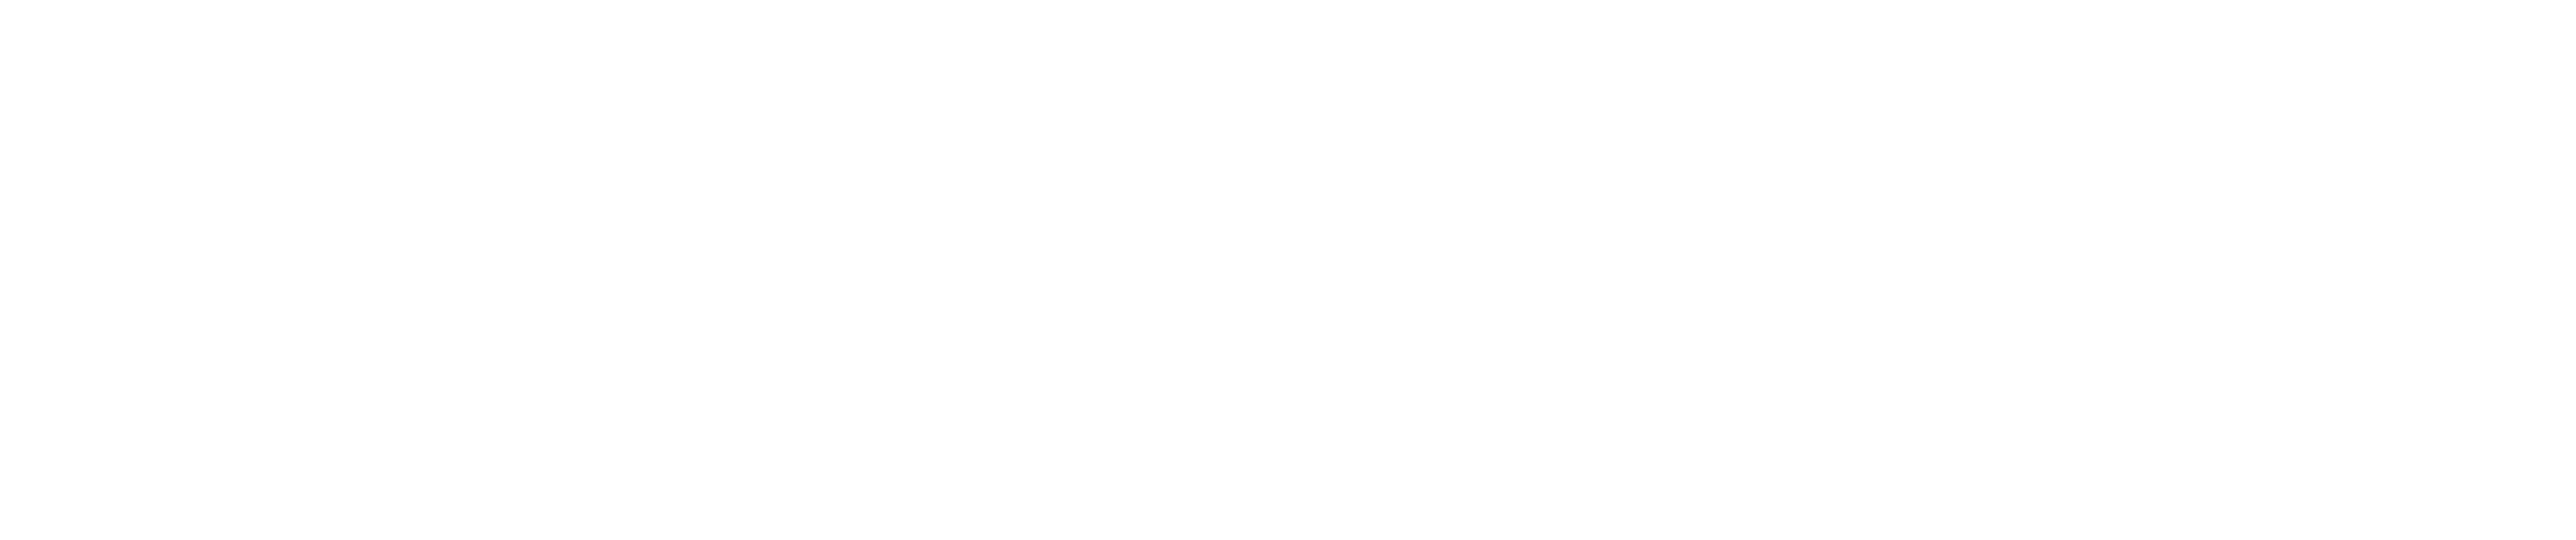 Outpost24-logo-01